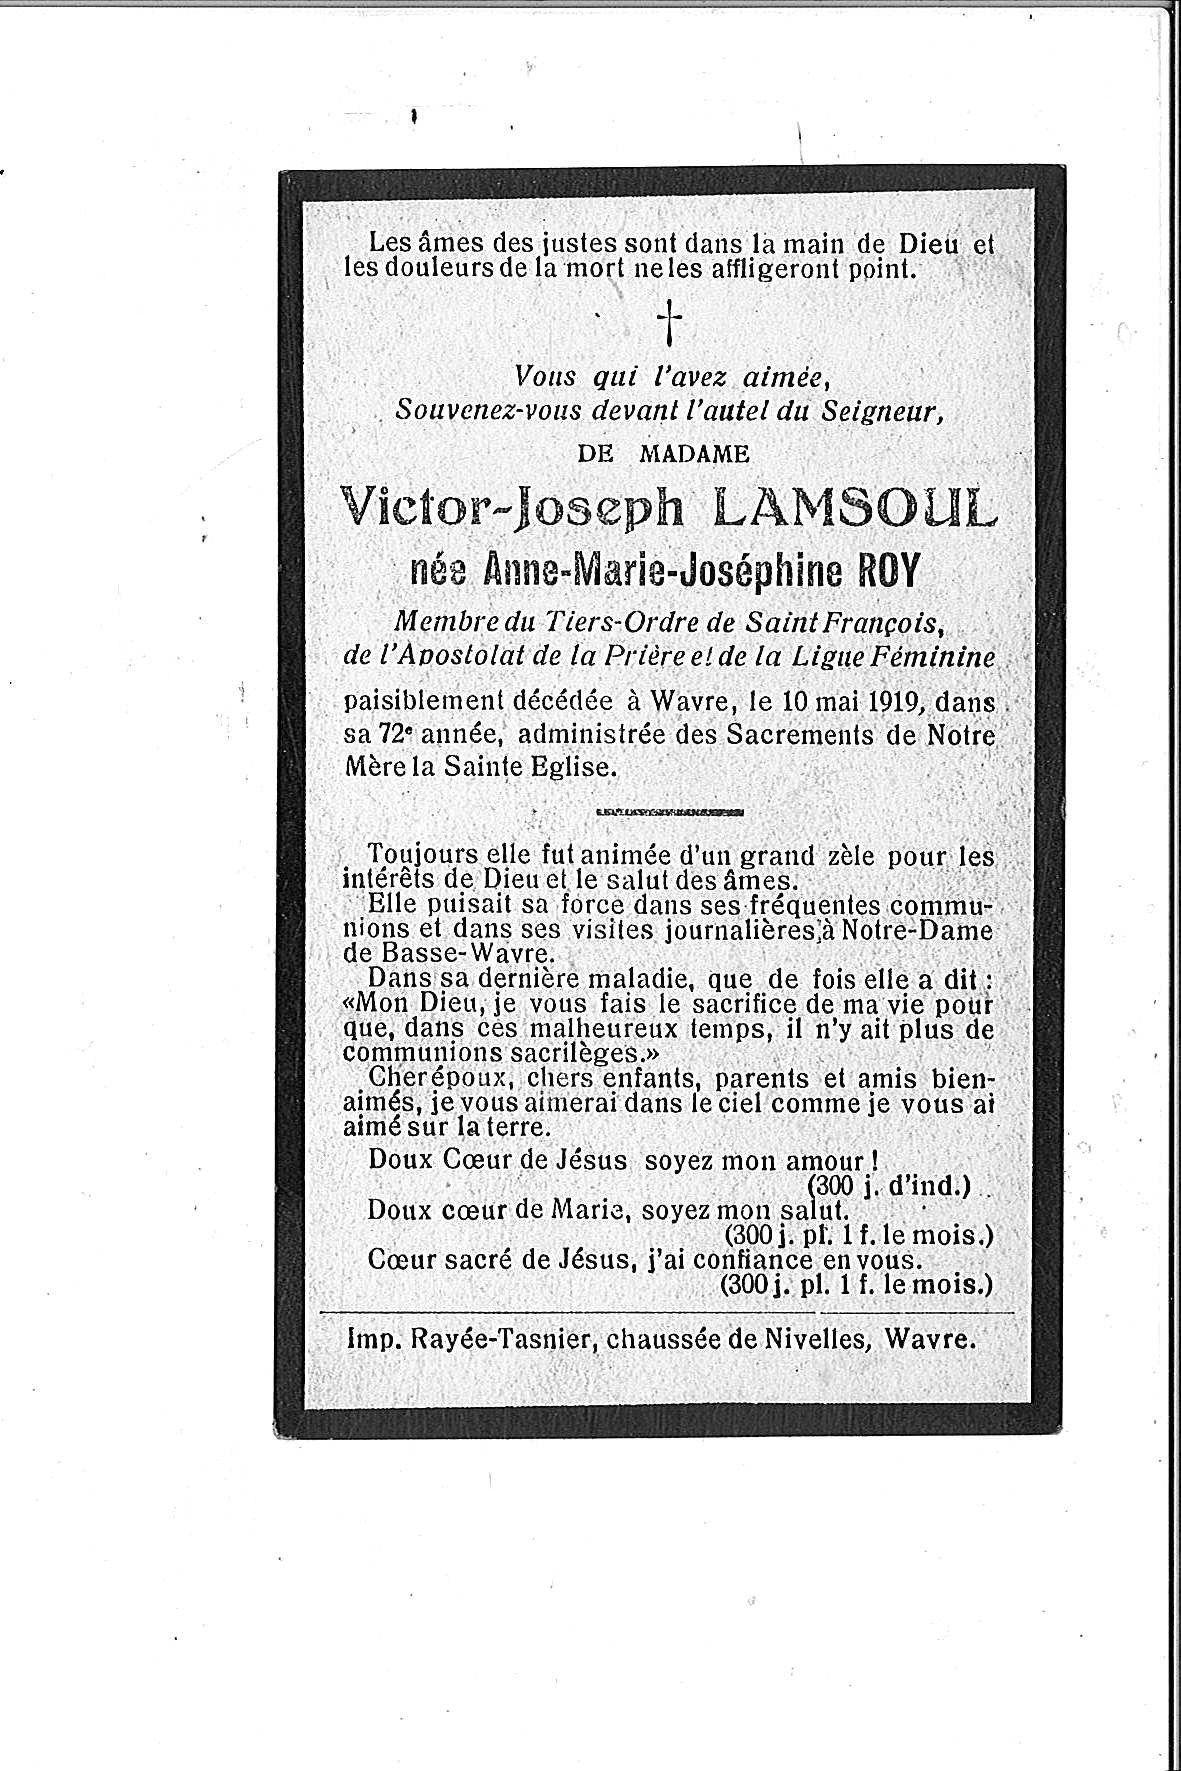 Anne-Marie-Joséphine(1919)20150107151538_00023.jpg